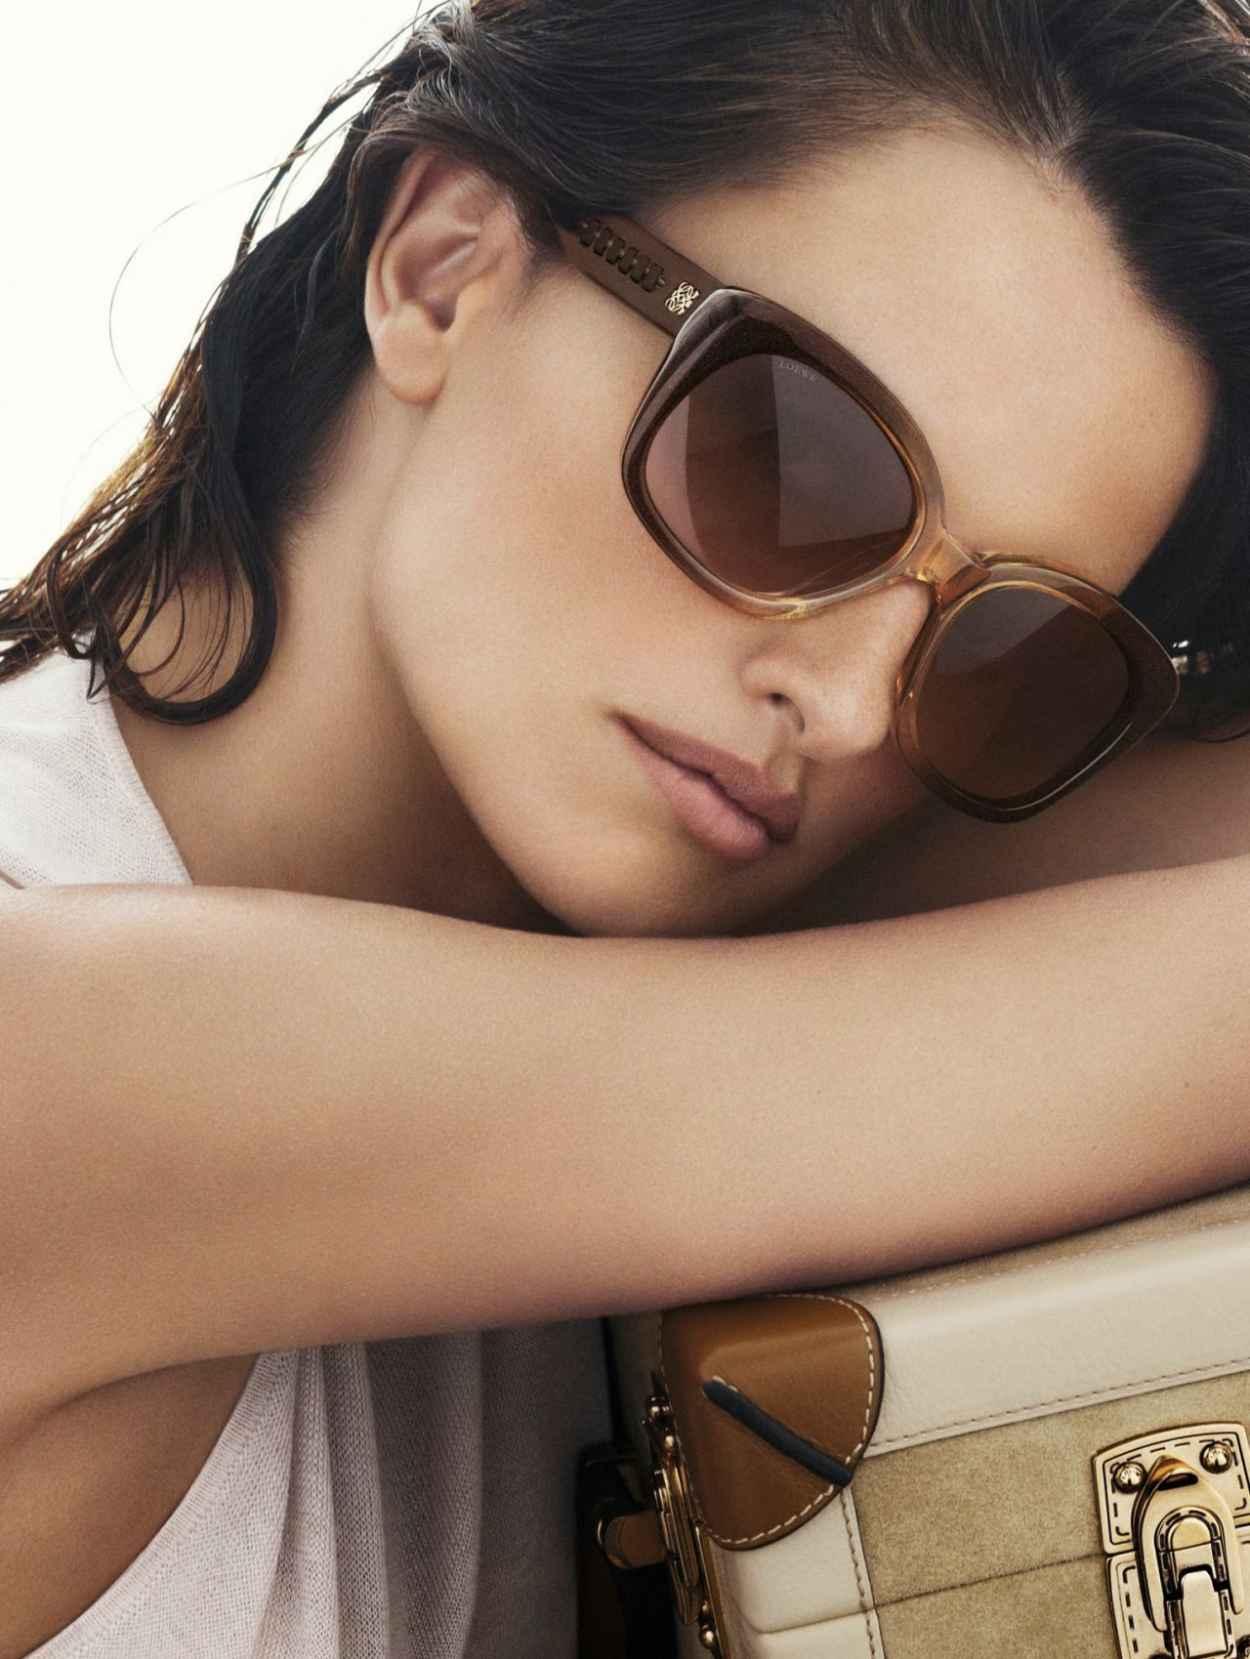 Penelope Cruz - Loewe Spring/Summer 2015 Photoshoot by Mert Alas & Marcus Piggott-1